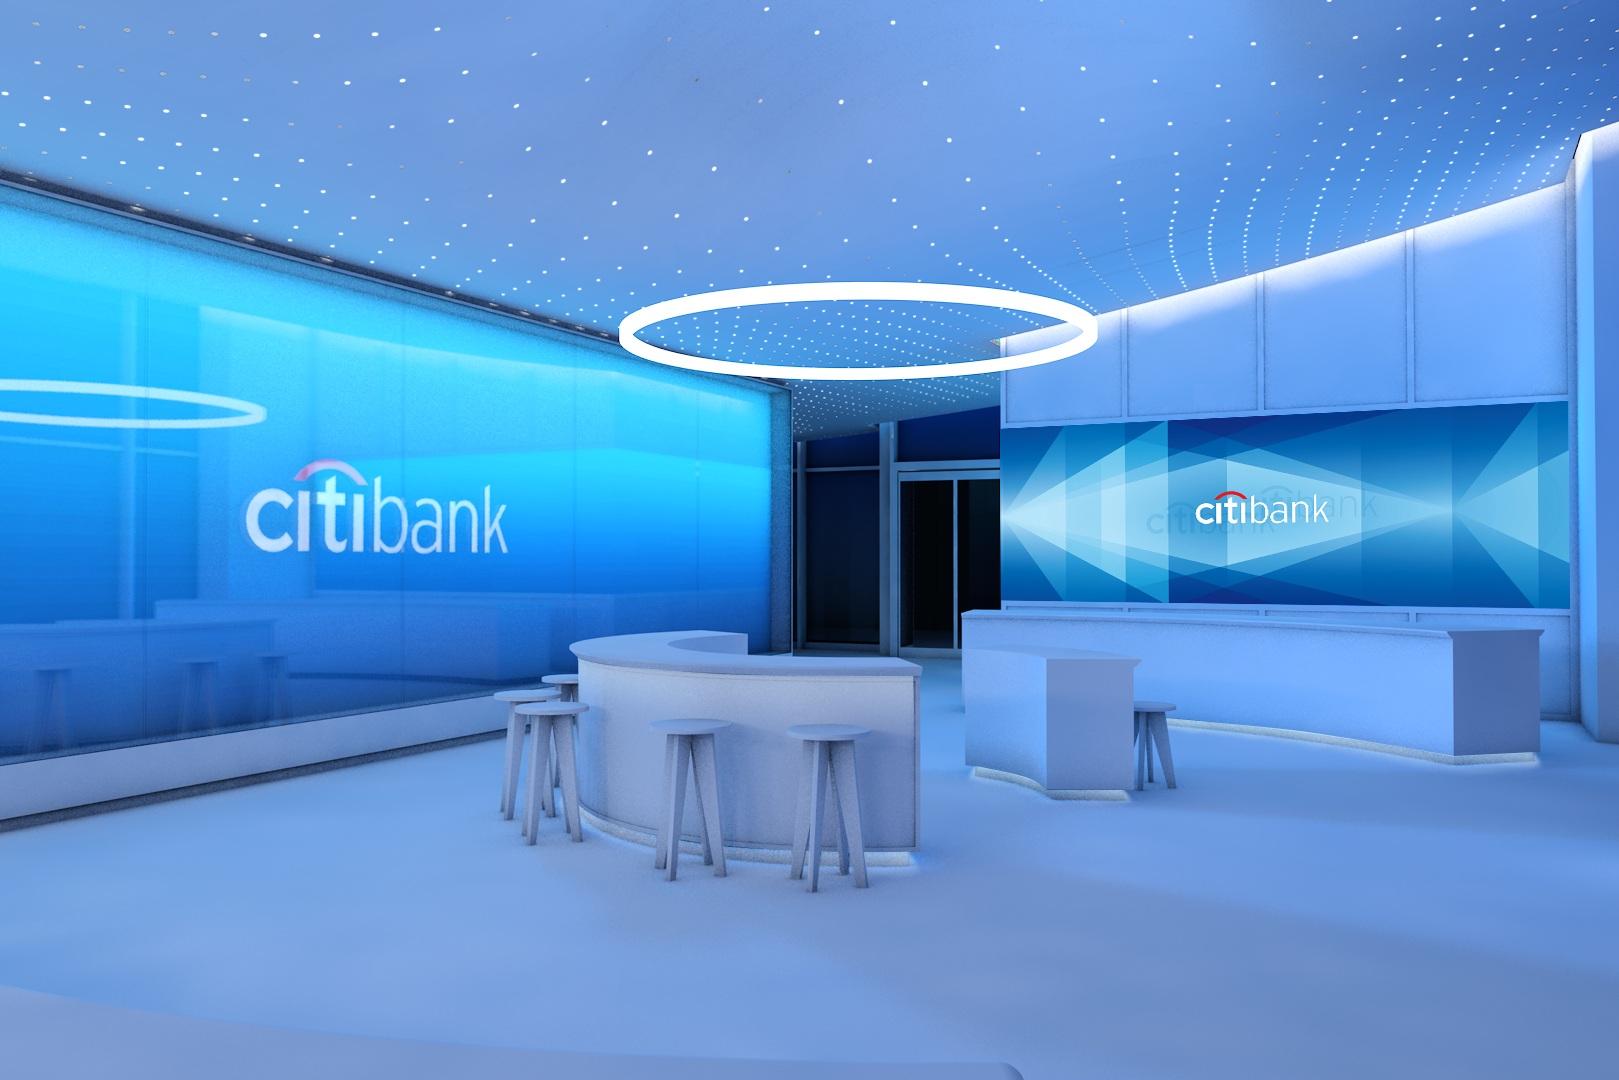 citi bank -